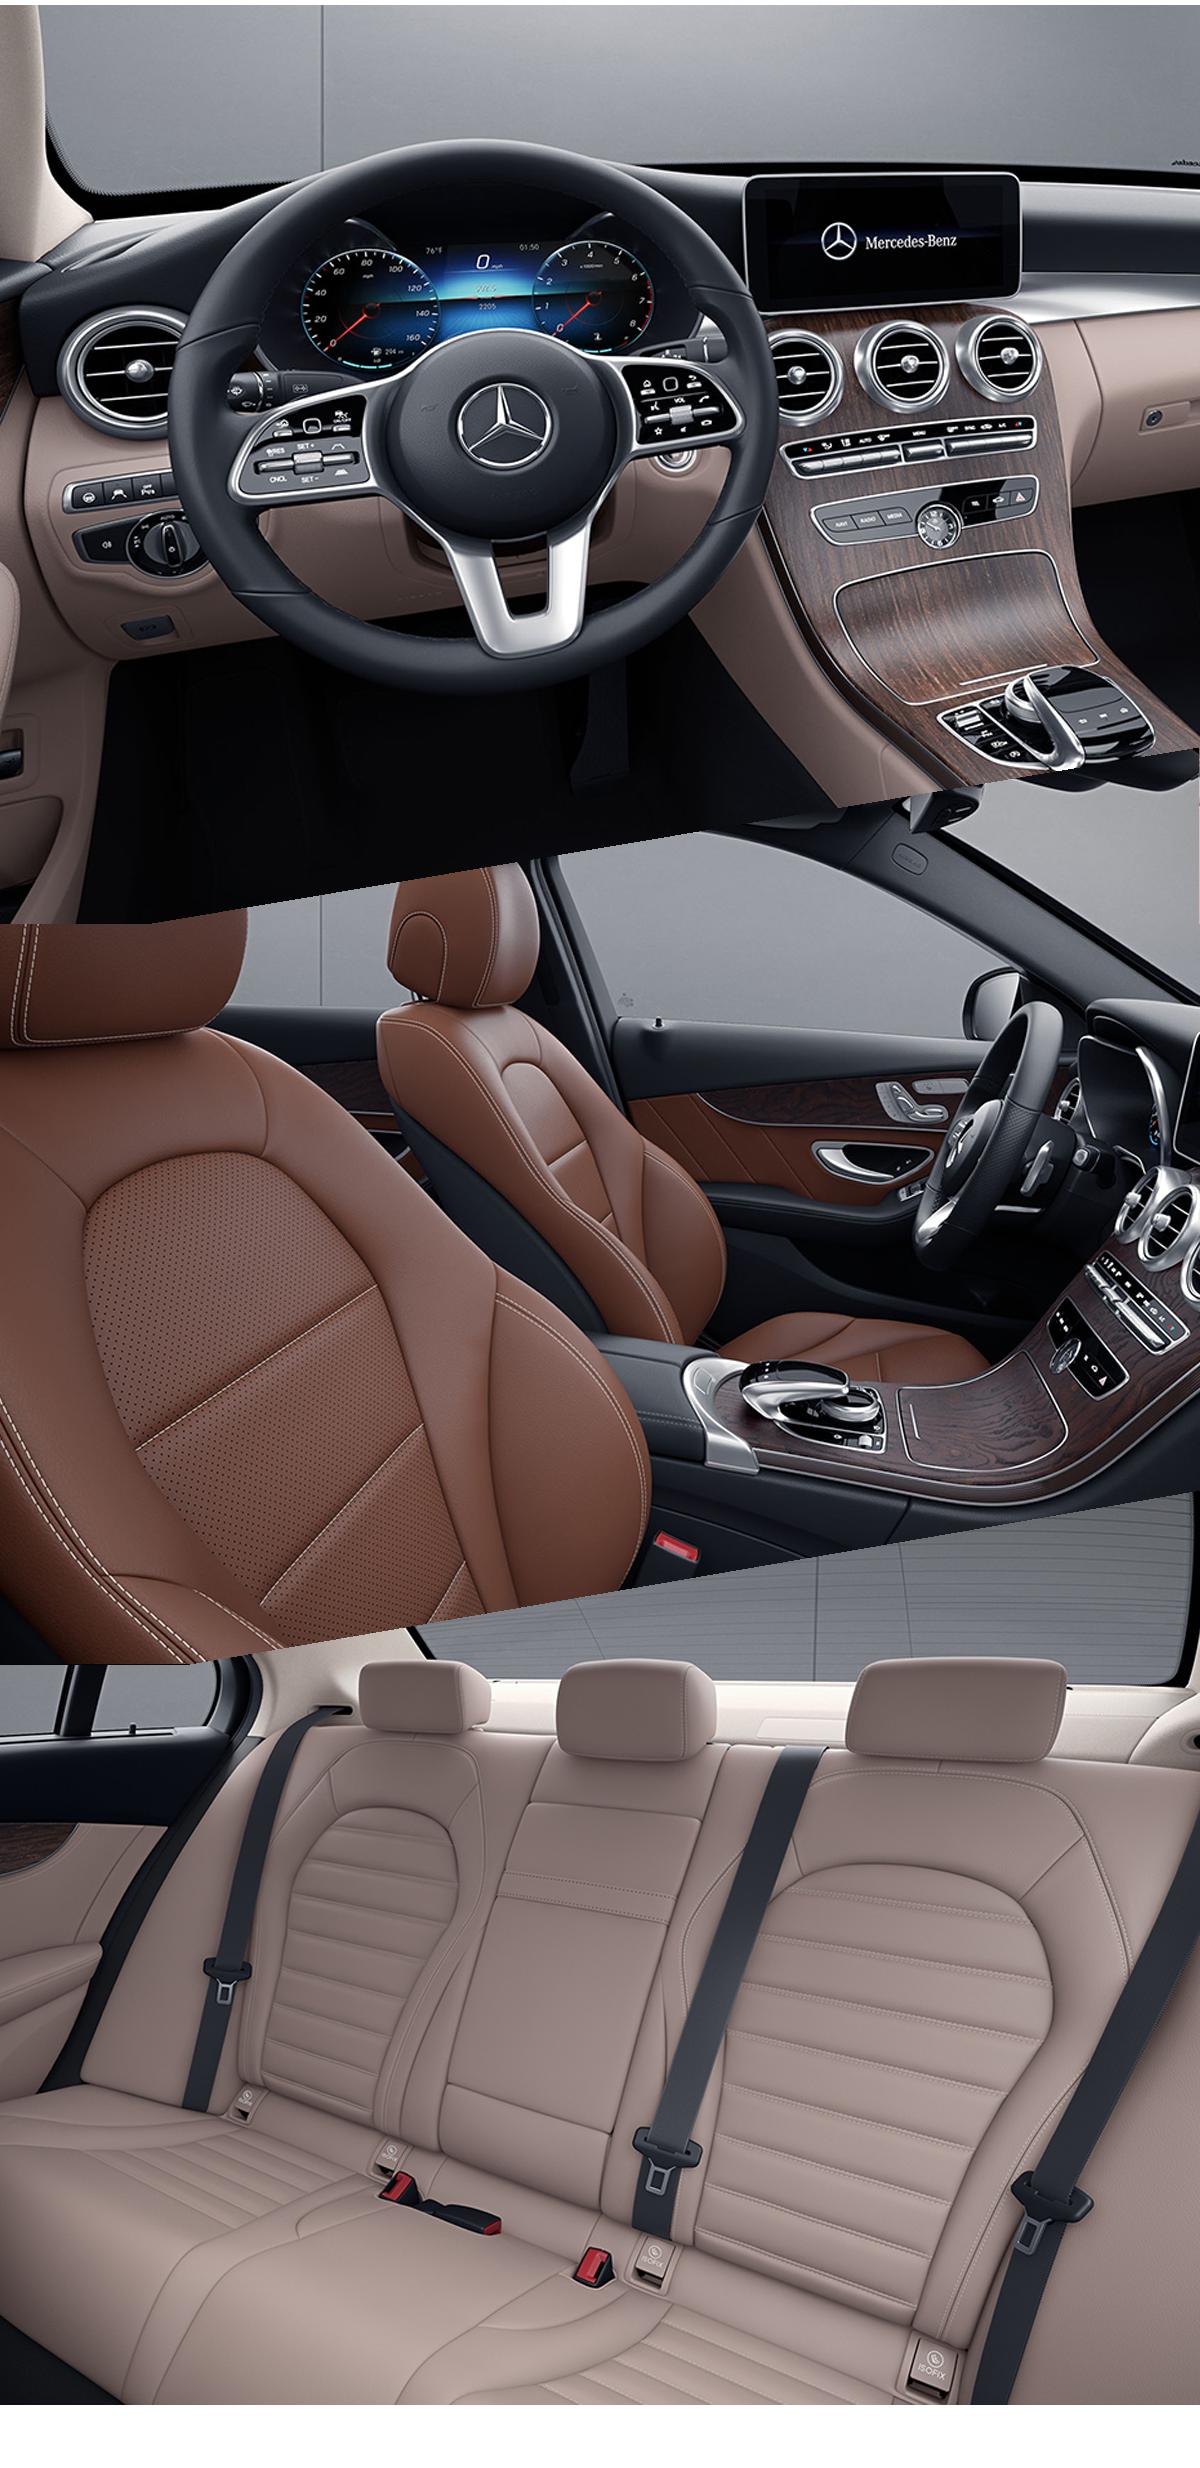 2021 Mercedes-Benz C-Class Interior Images